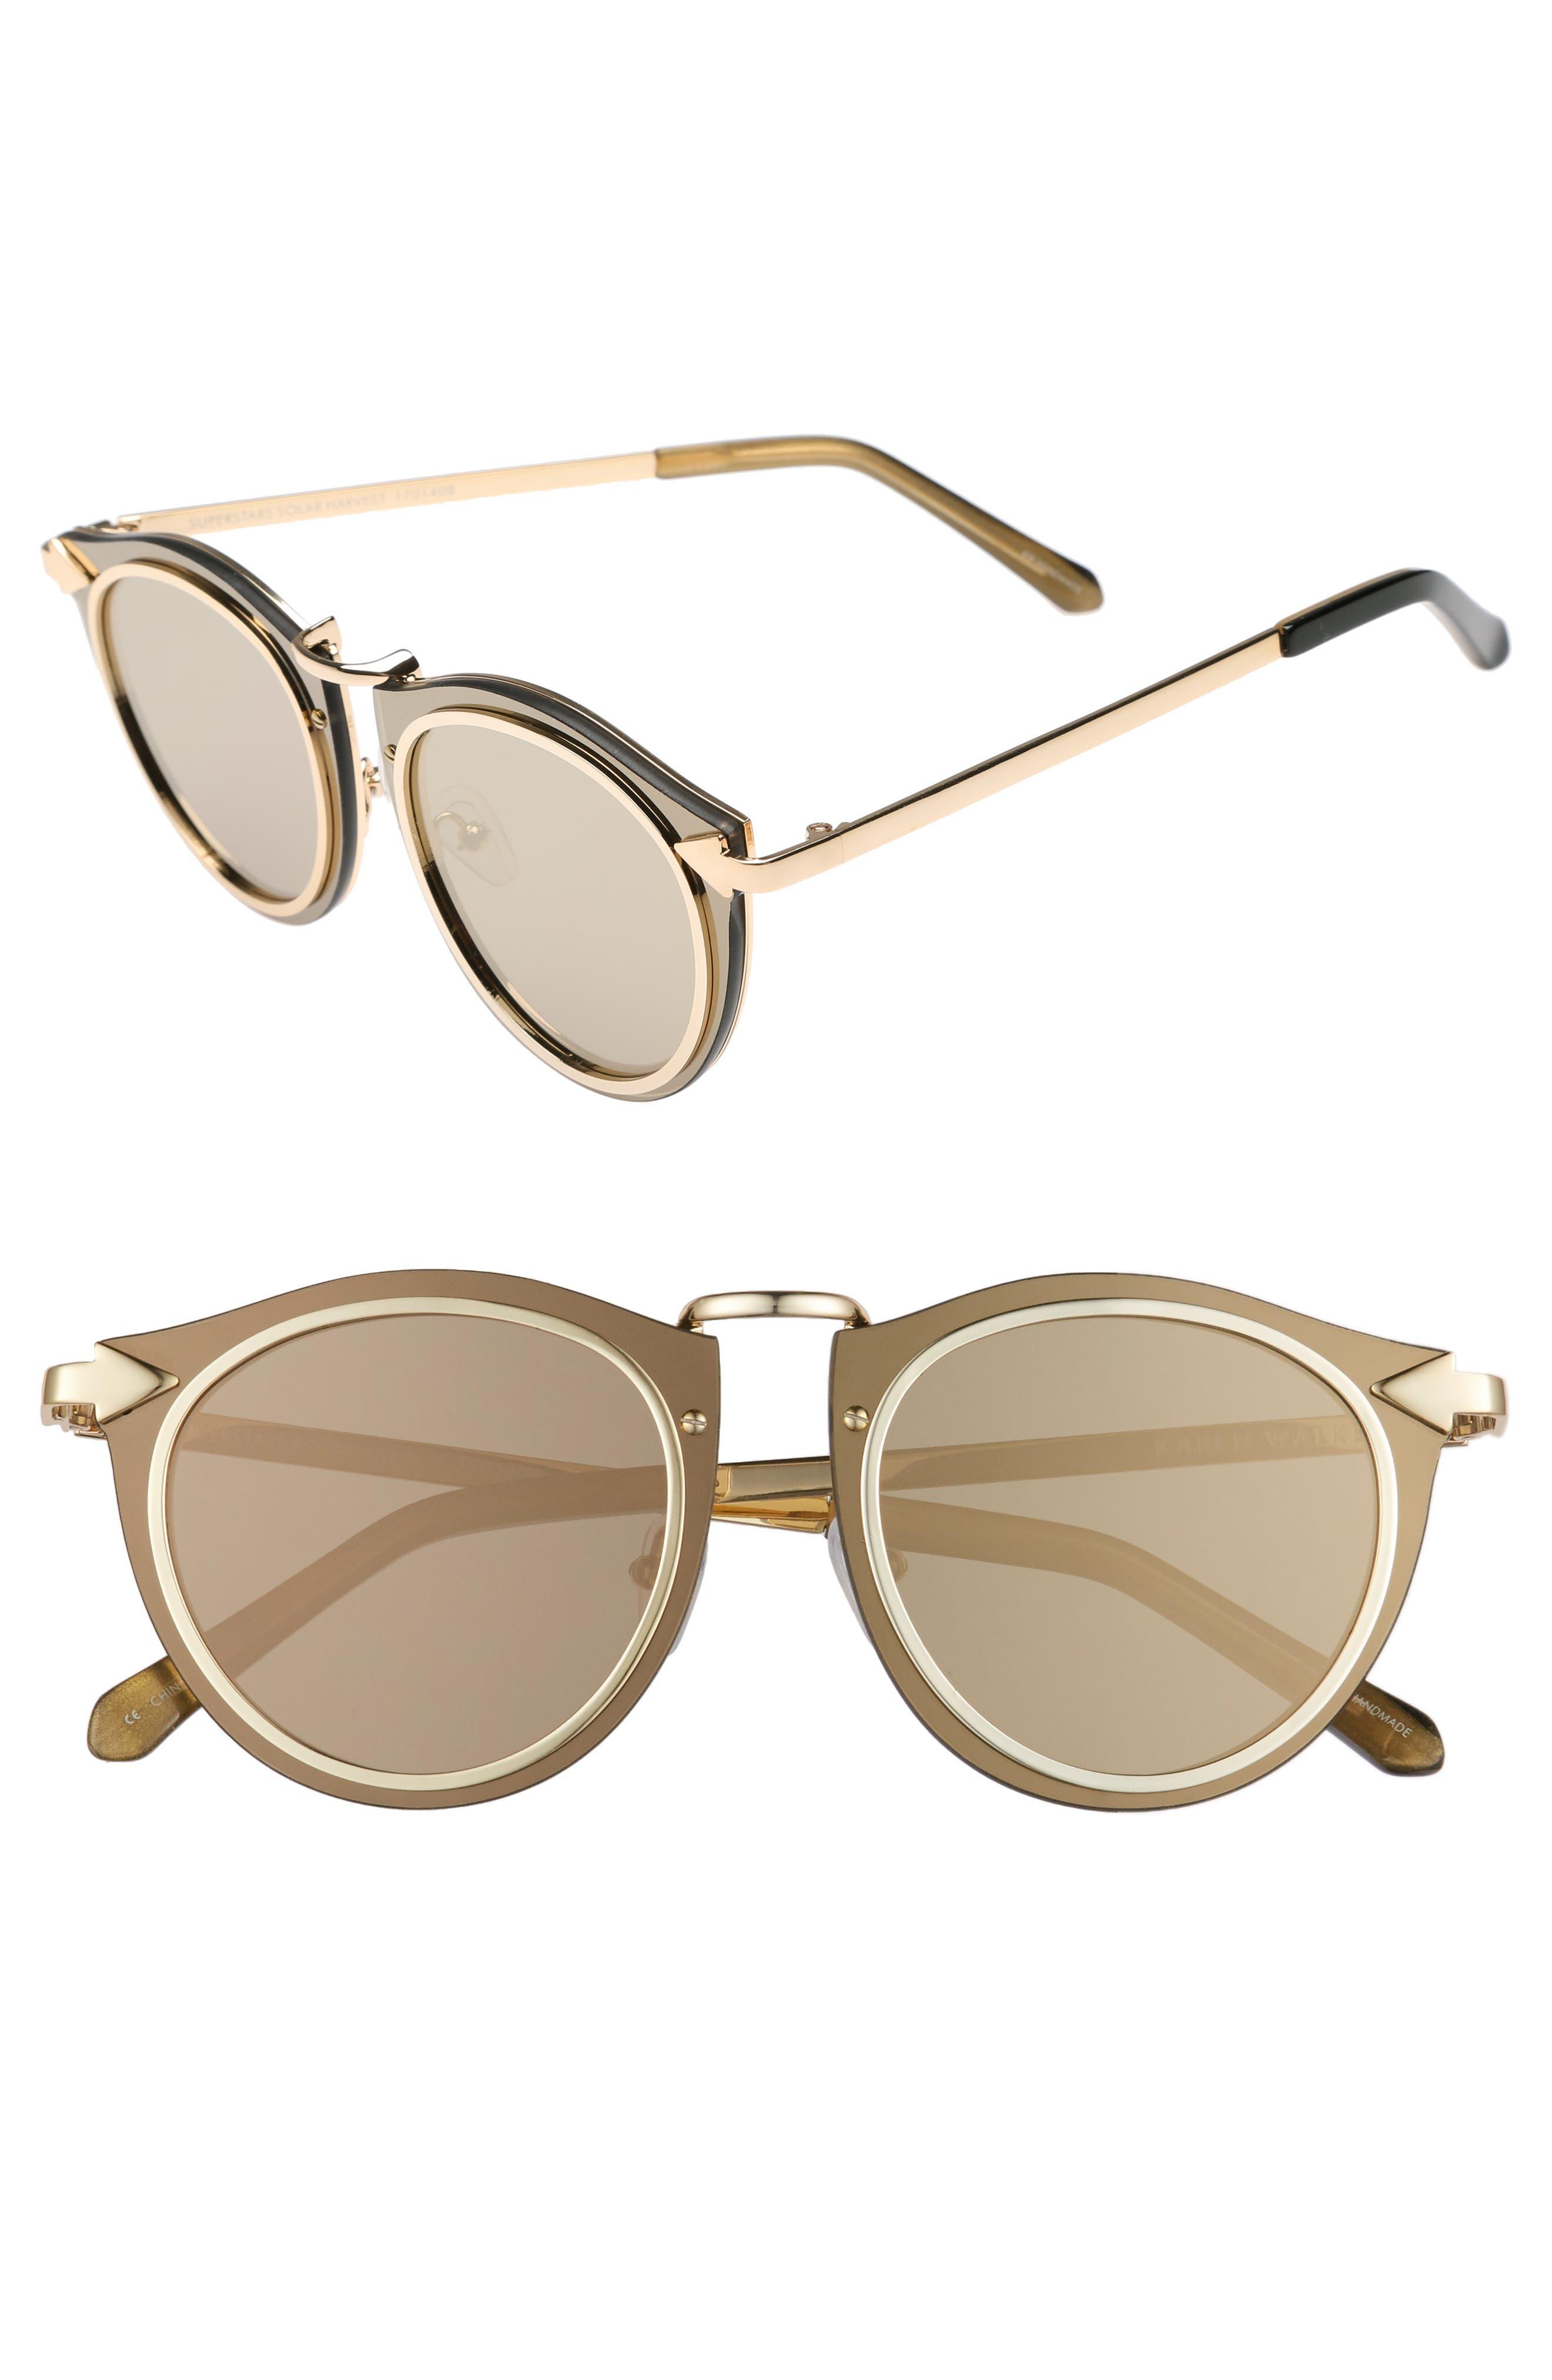 Superstars - Solar 50mm Retro Sunglasses,                         Main,                         color, Gold